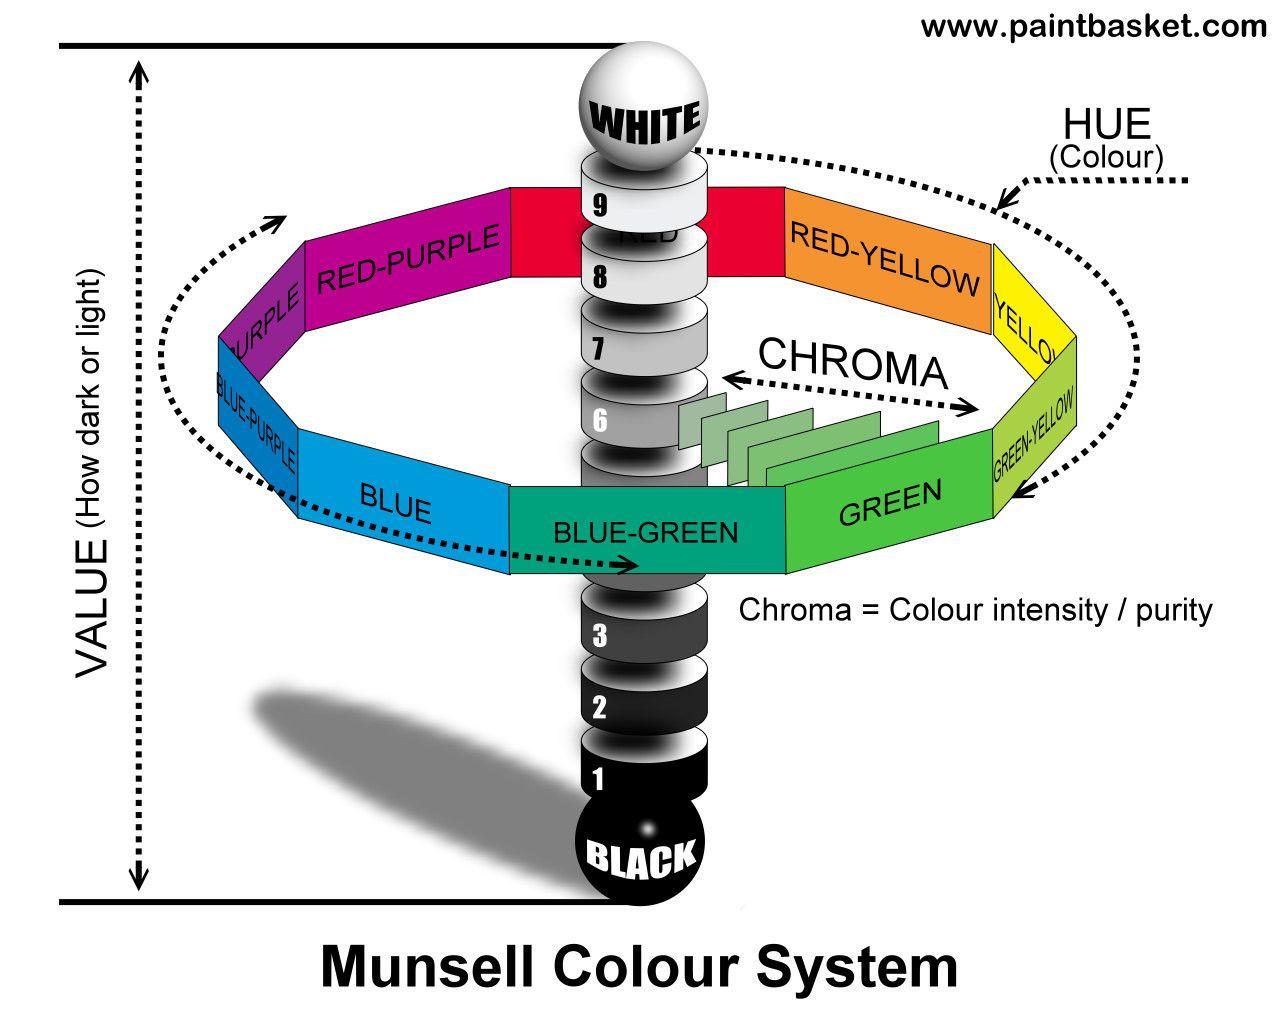 httpwwwpaintbasketcommunsellmunsell_printjpg munsell colour system palettes books mediums tools etc pinterest munsell color system - Munsell Book Of Color Pdf